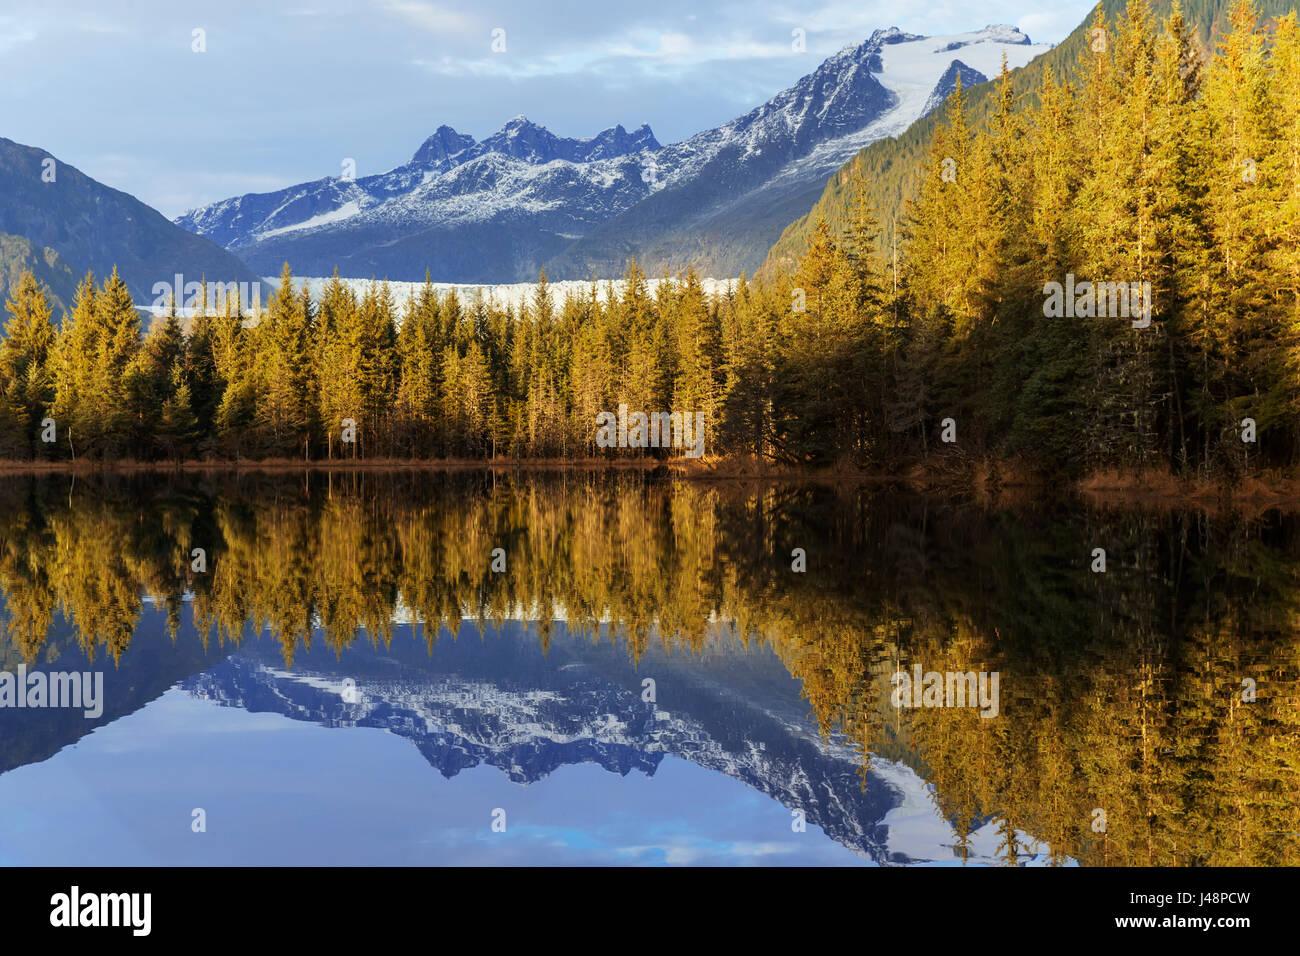 Moraine Lake at sunset, Mendenhall Recreation Area, Tongass National Forest, near Juneau; Alaska, United States - Stock Image